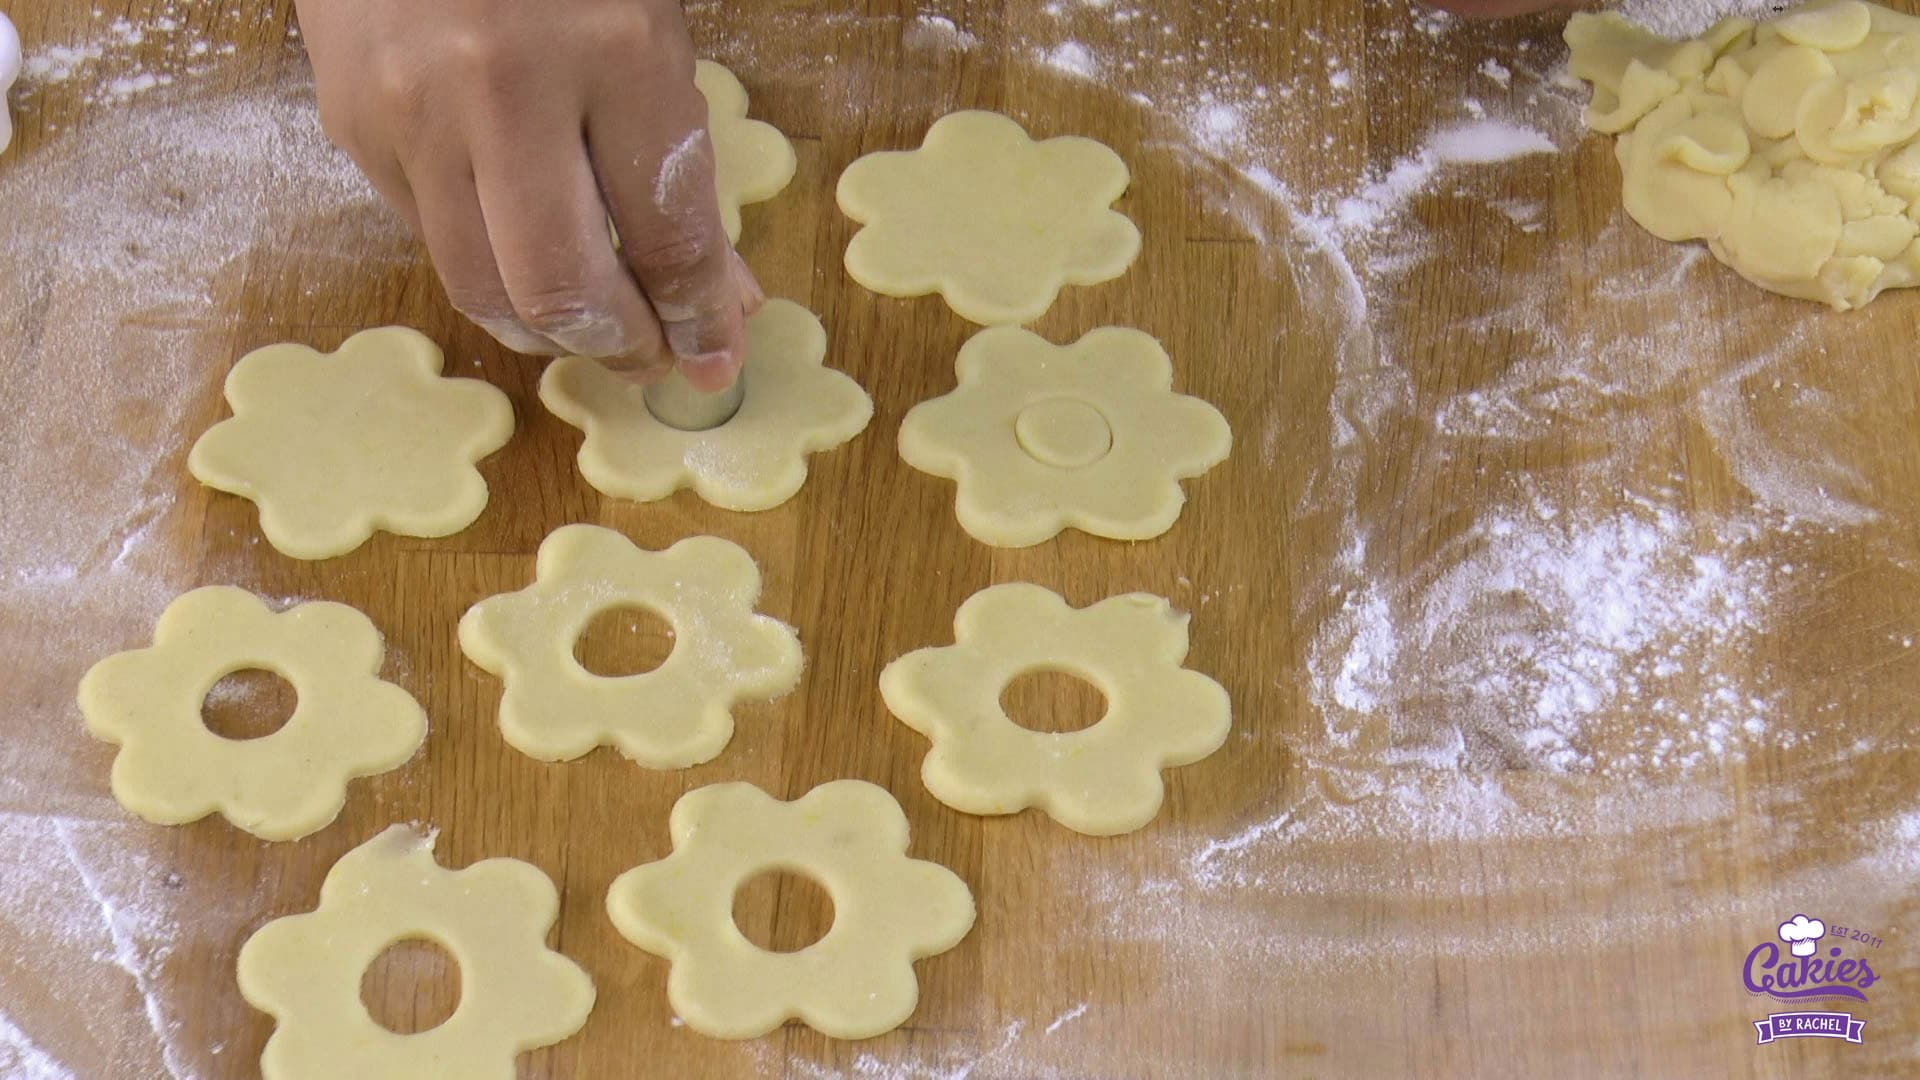 Kerstkransjes Dutch Christmas Cookies 16 Cakies